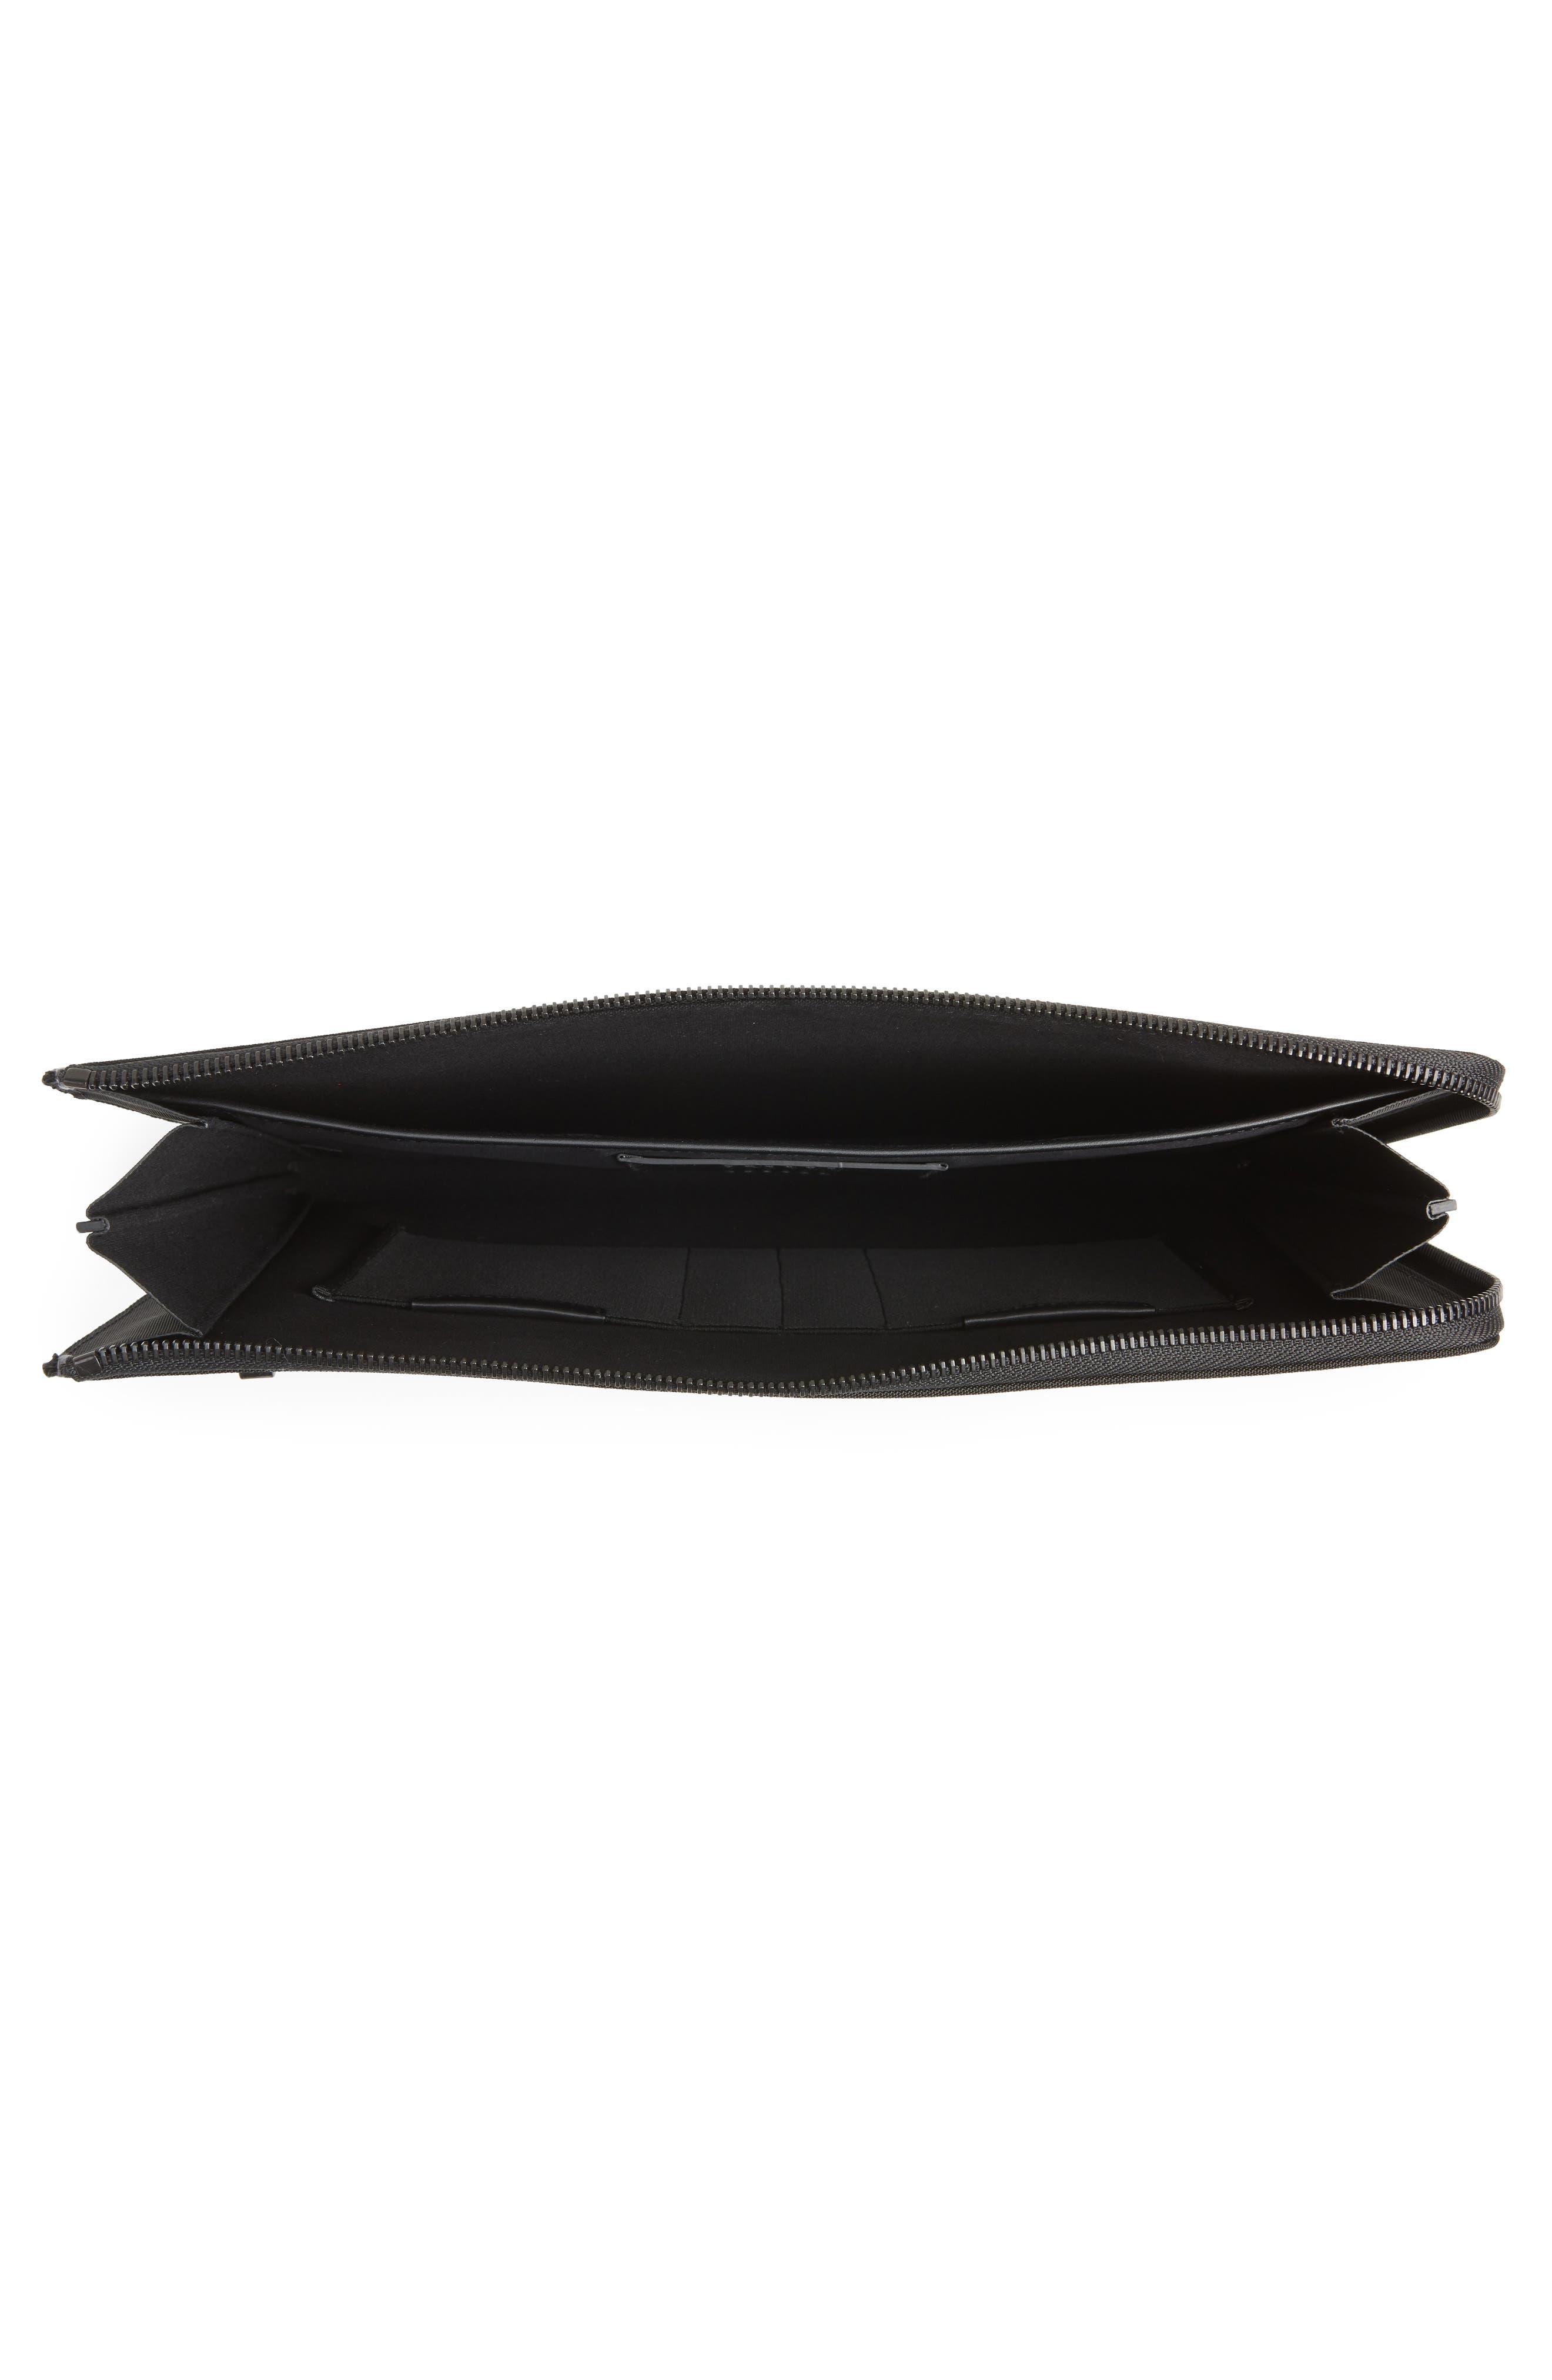 Portfolio Case,                             Alternate thumbnail 3, color,                             Black Nylon/ Black Leather